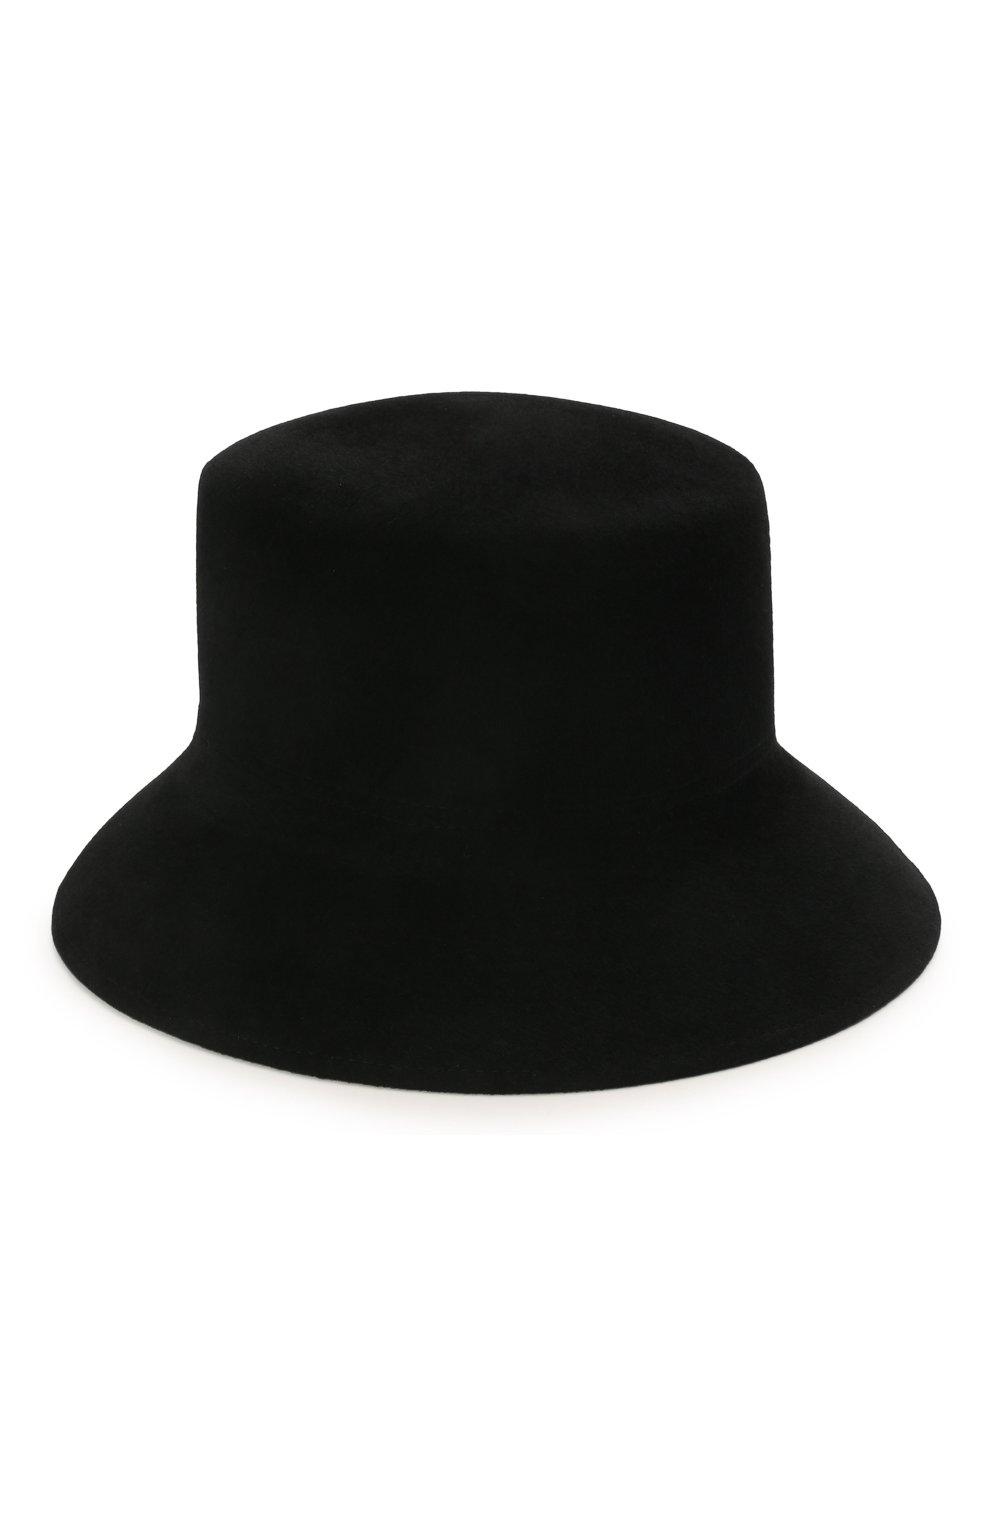 Женская шляпа panama COCOSHNICK HEADDRESS черного цвета, арт. basel-02 | Фото 1